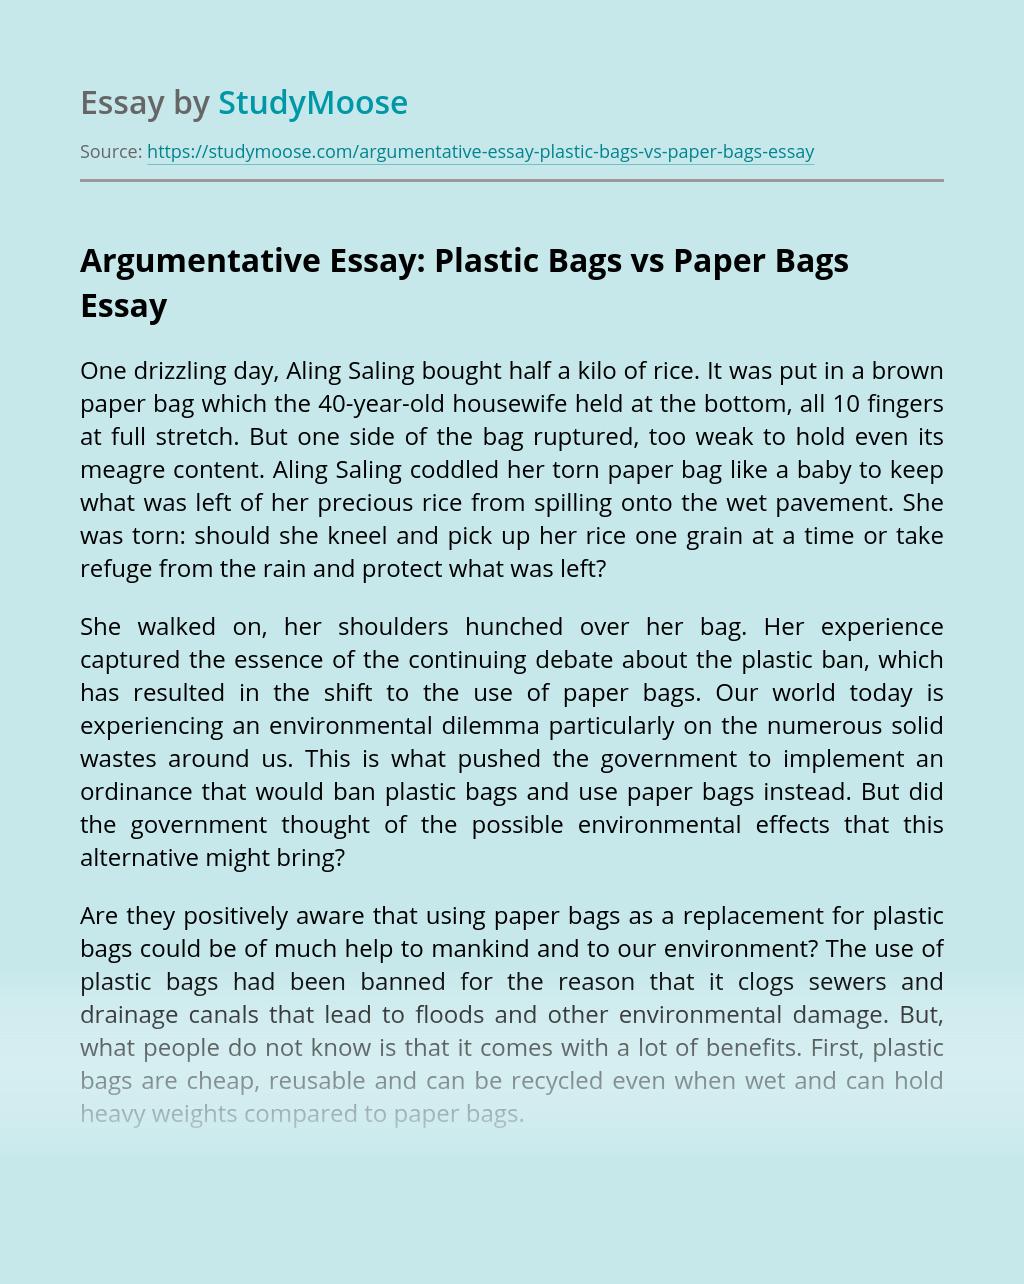 Argumentative Essay: Plastic Bags vs Paper Bags